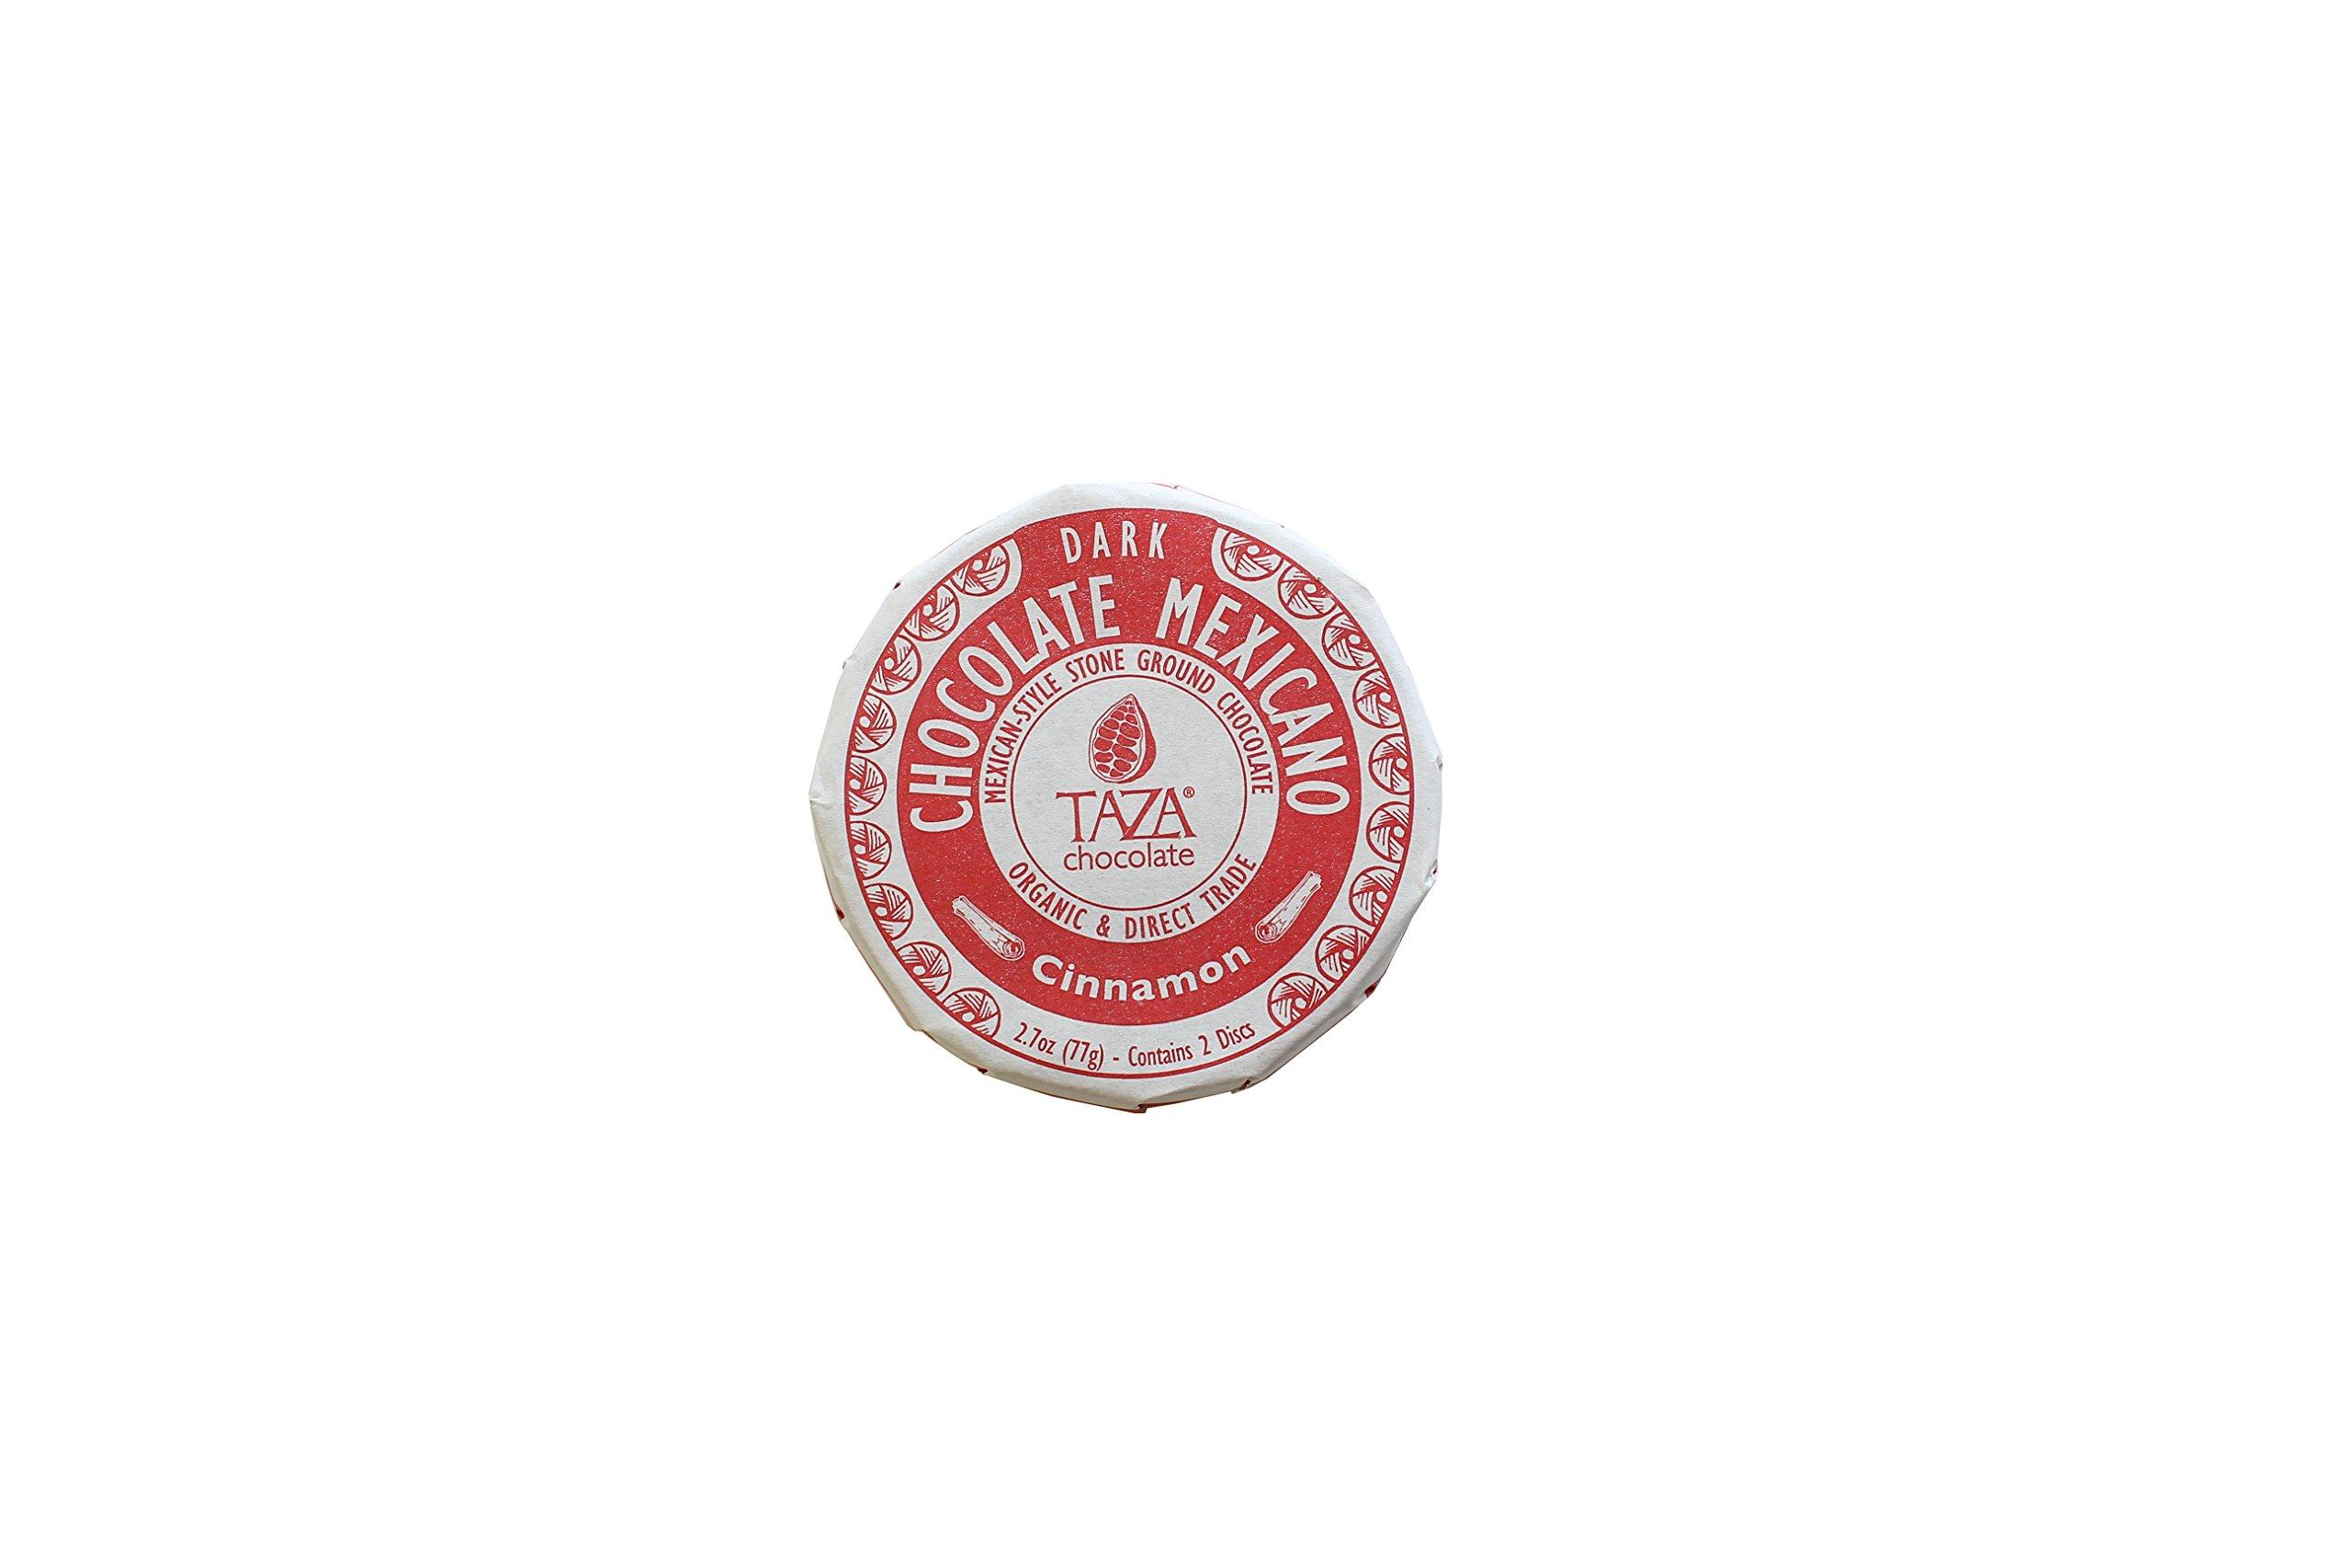 Taza Chocolate Mexicano Disc, 50% Dark Organic, Cinnamon, 2.7 Ounce